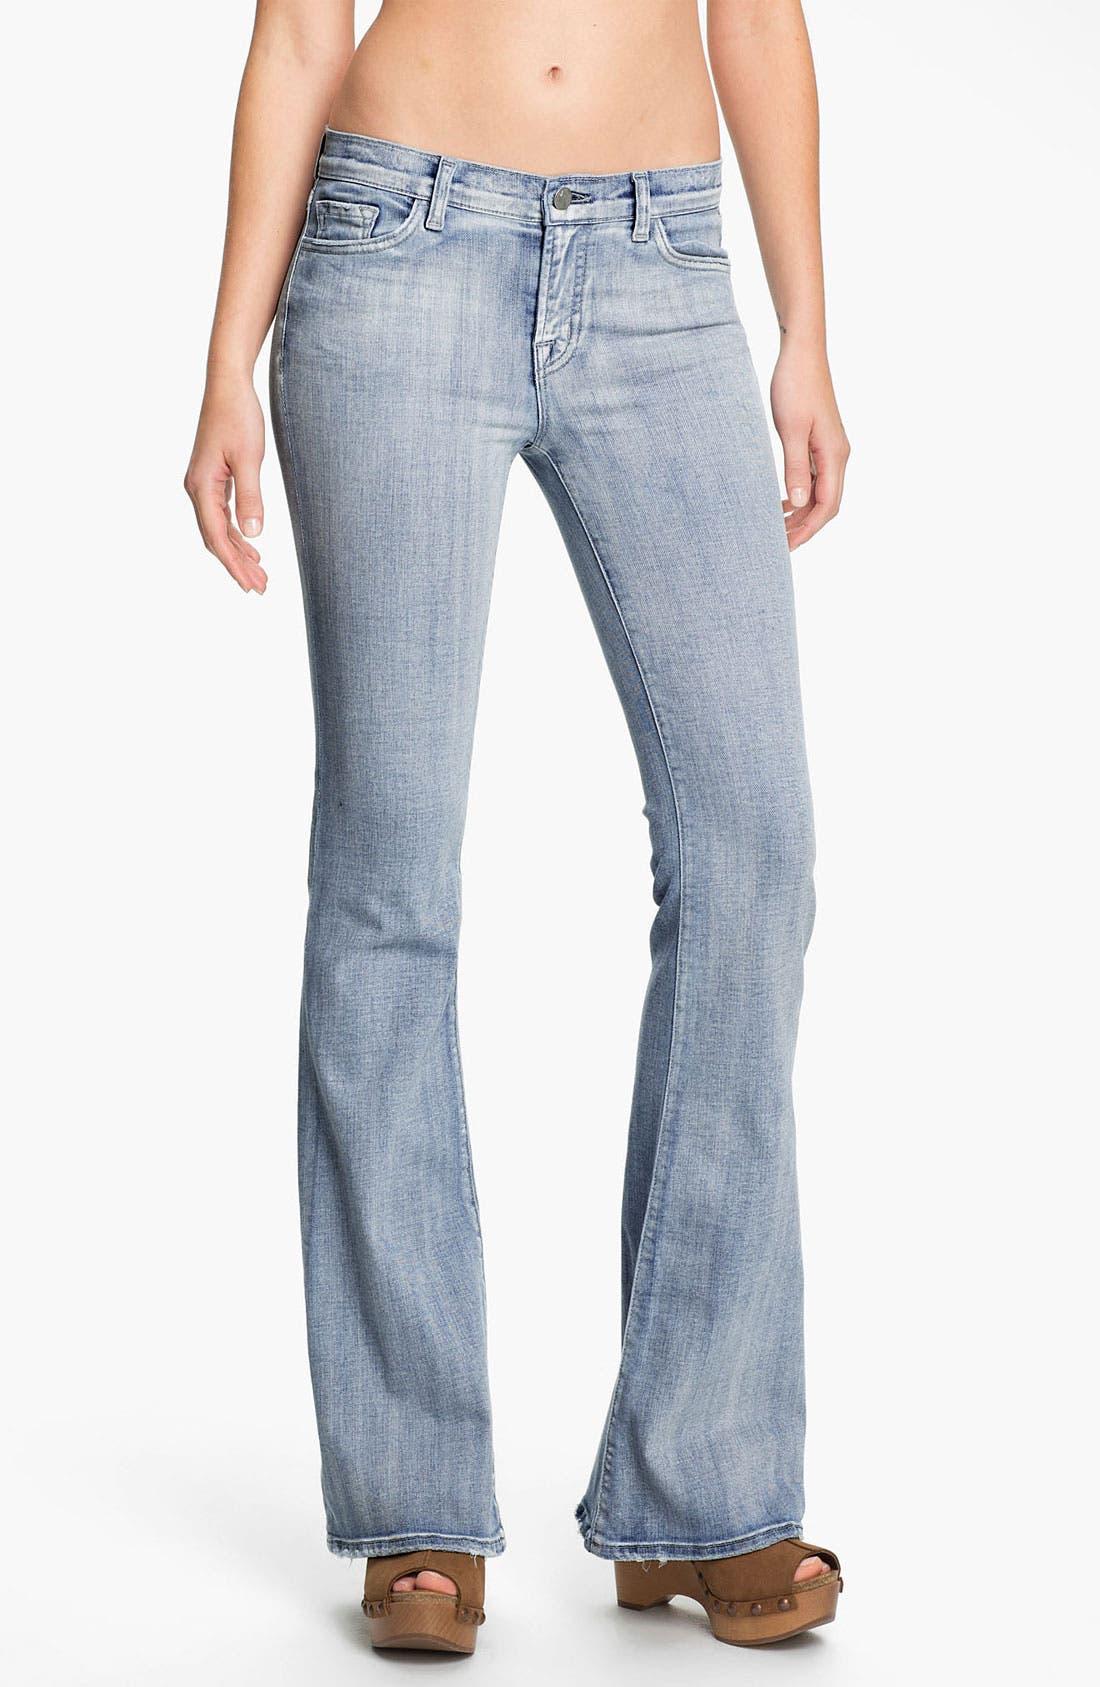 Alternate Image 1 Selected - J Brand 'Babe' Flare Leg Jeans (Afterlife)